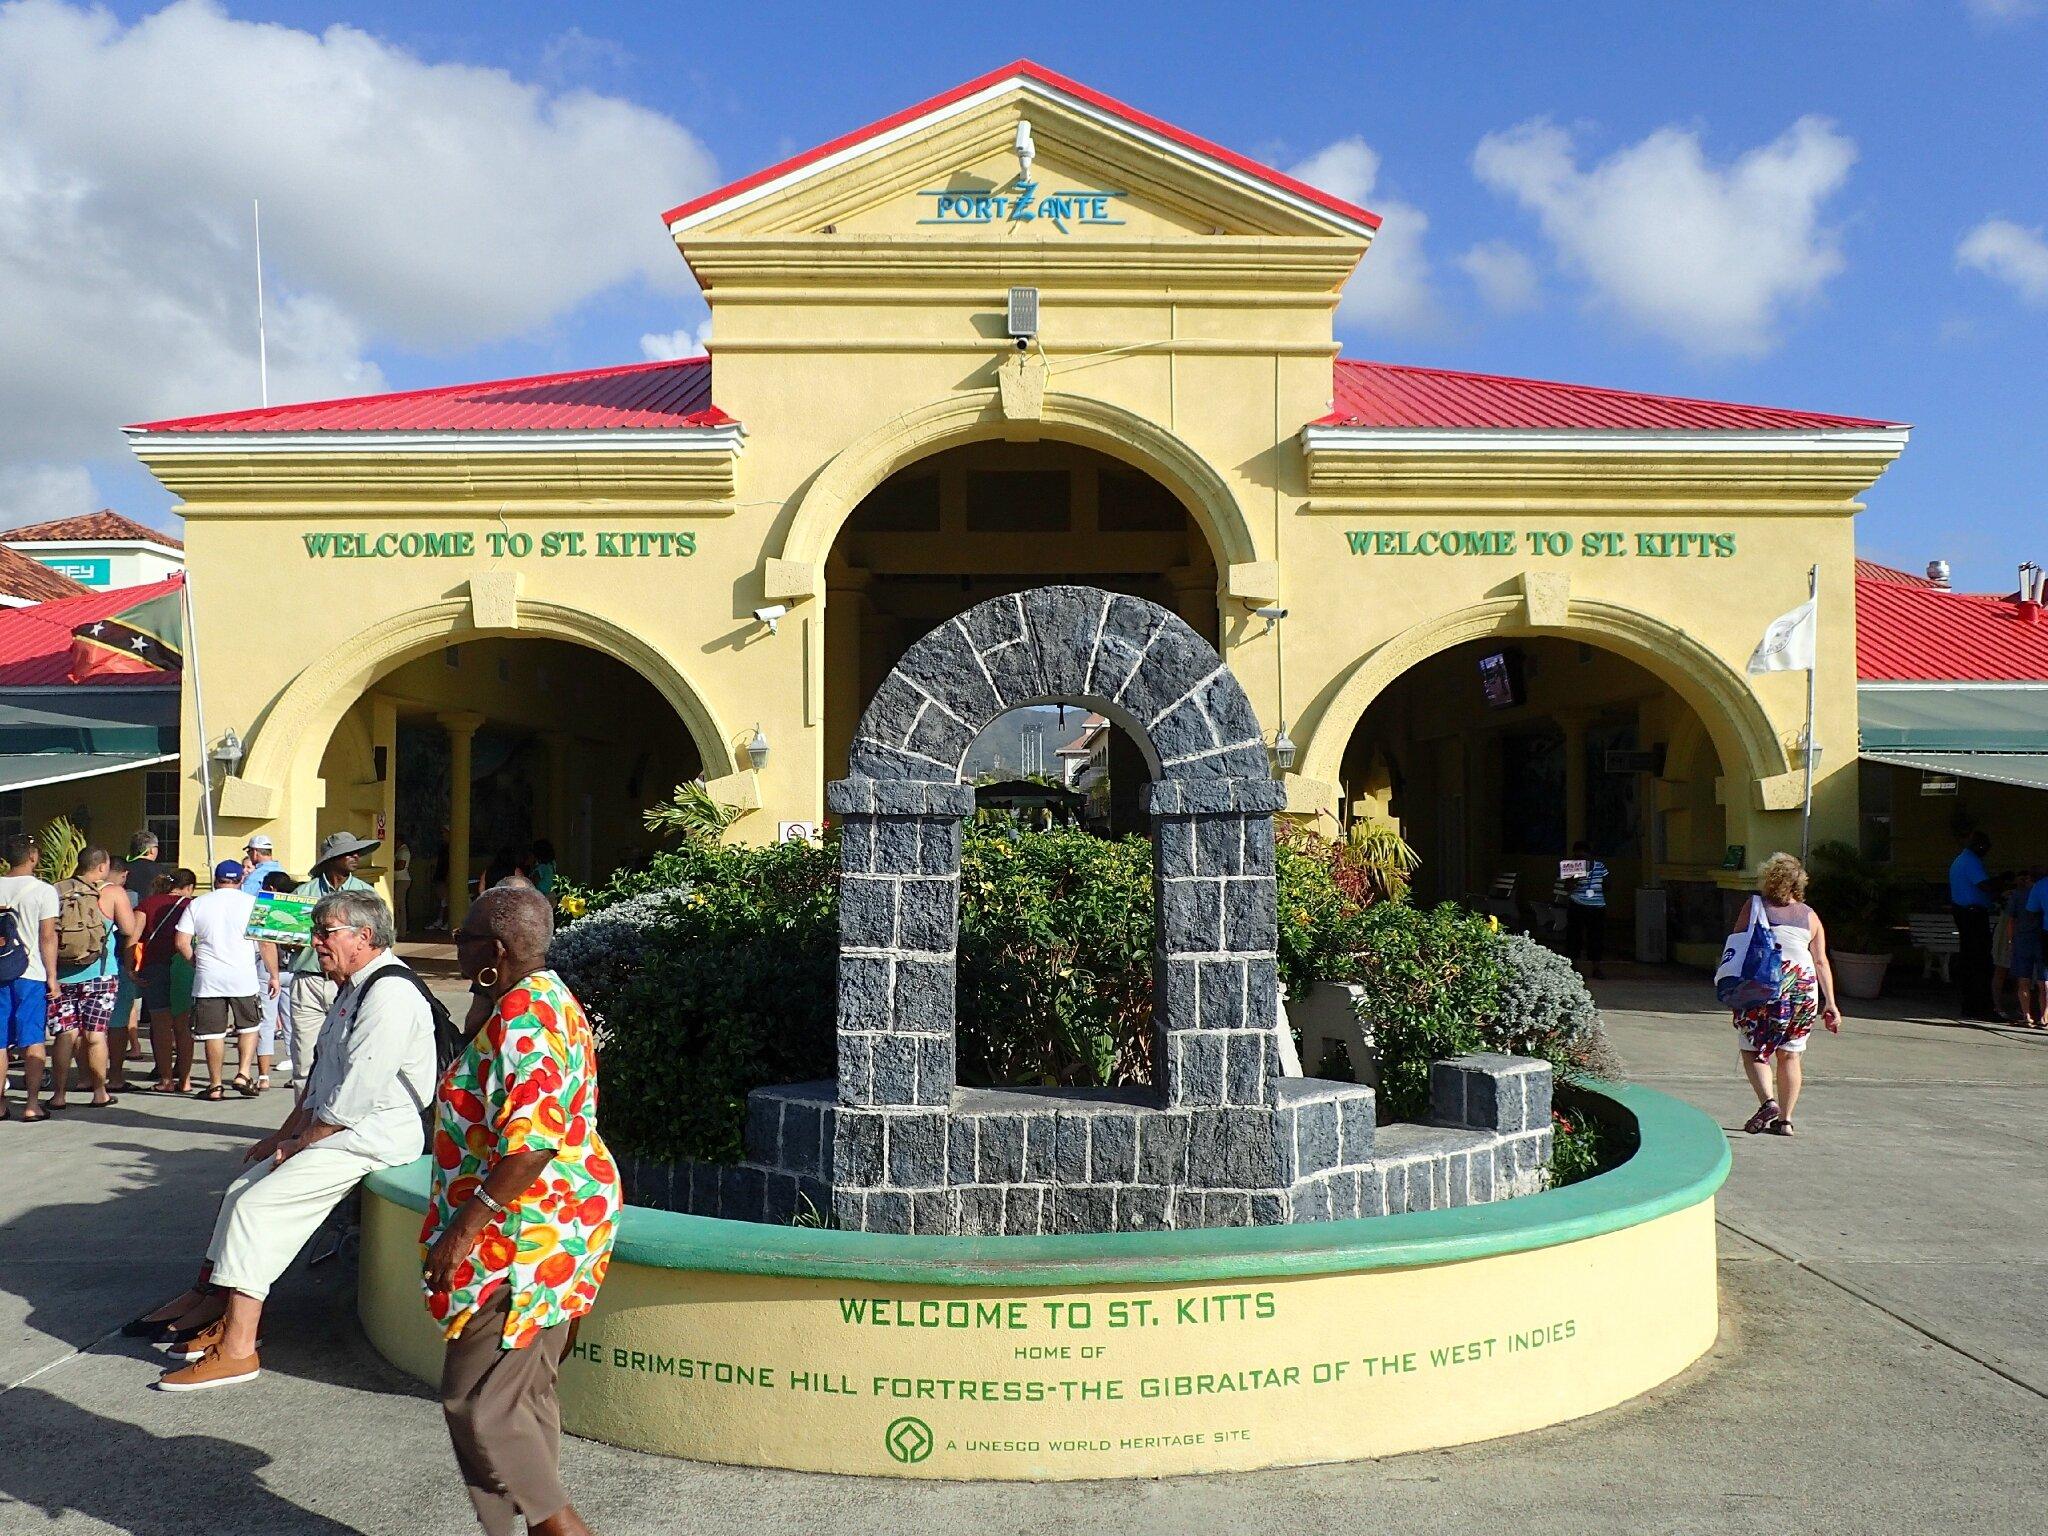 Vendredi 22 janvier 2016 : Saint-Kitts